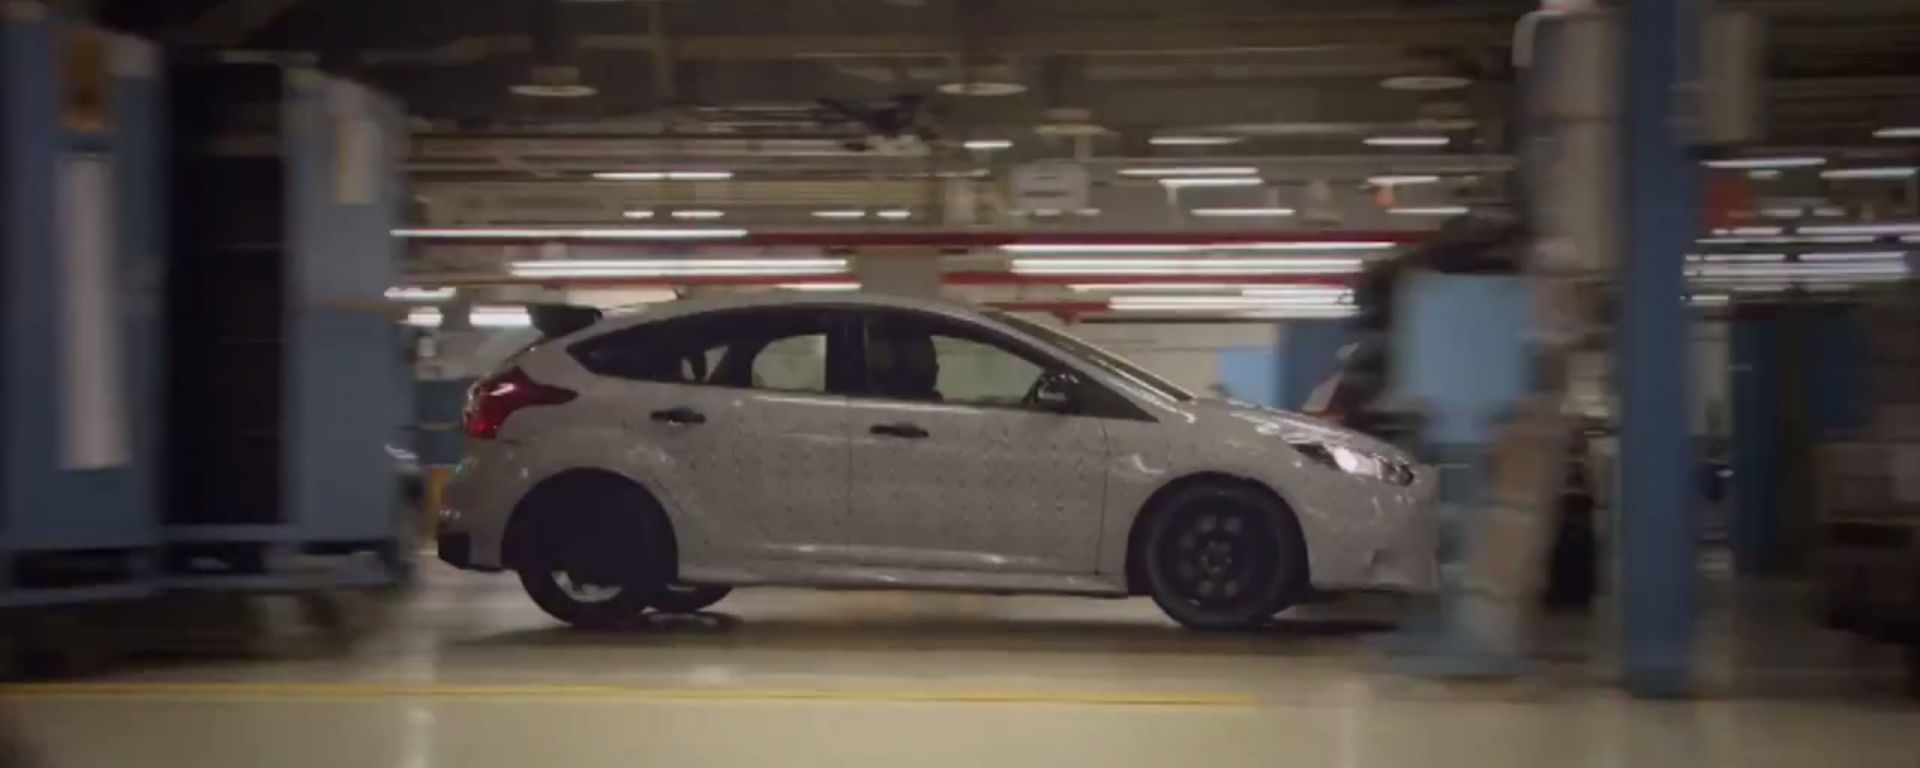 Ken Block guida la nuova Focus RS. A modo suo